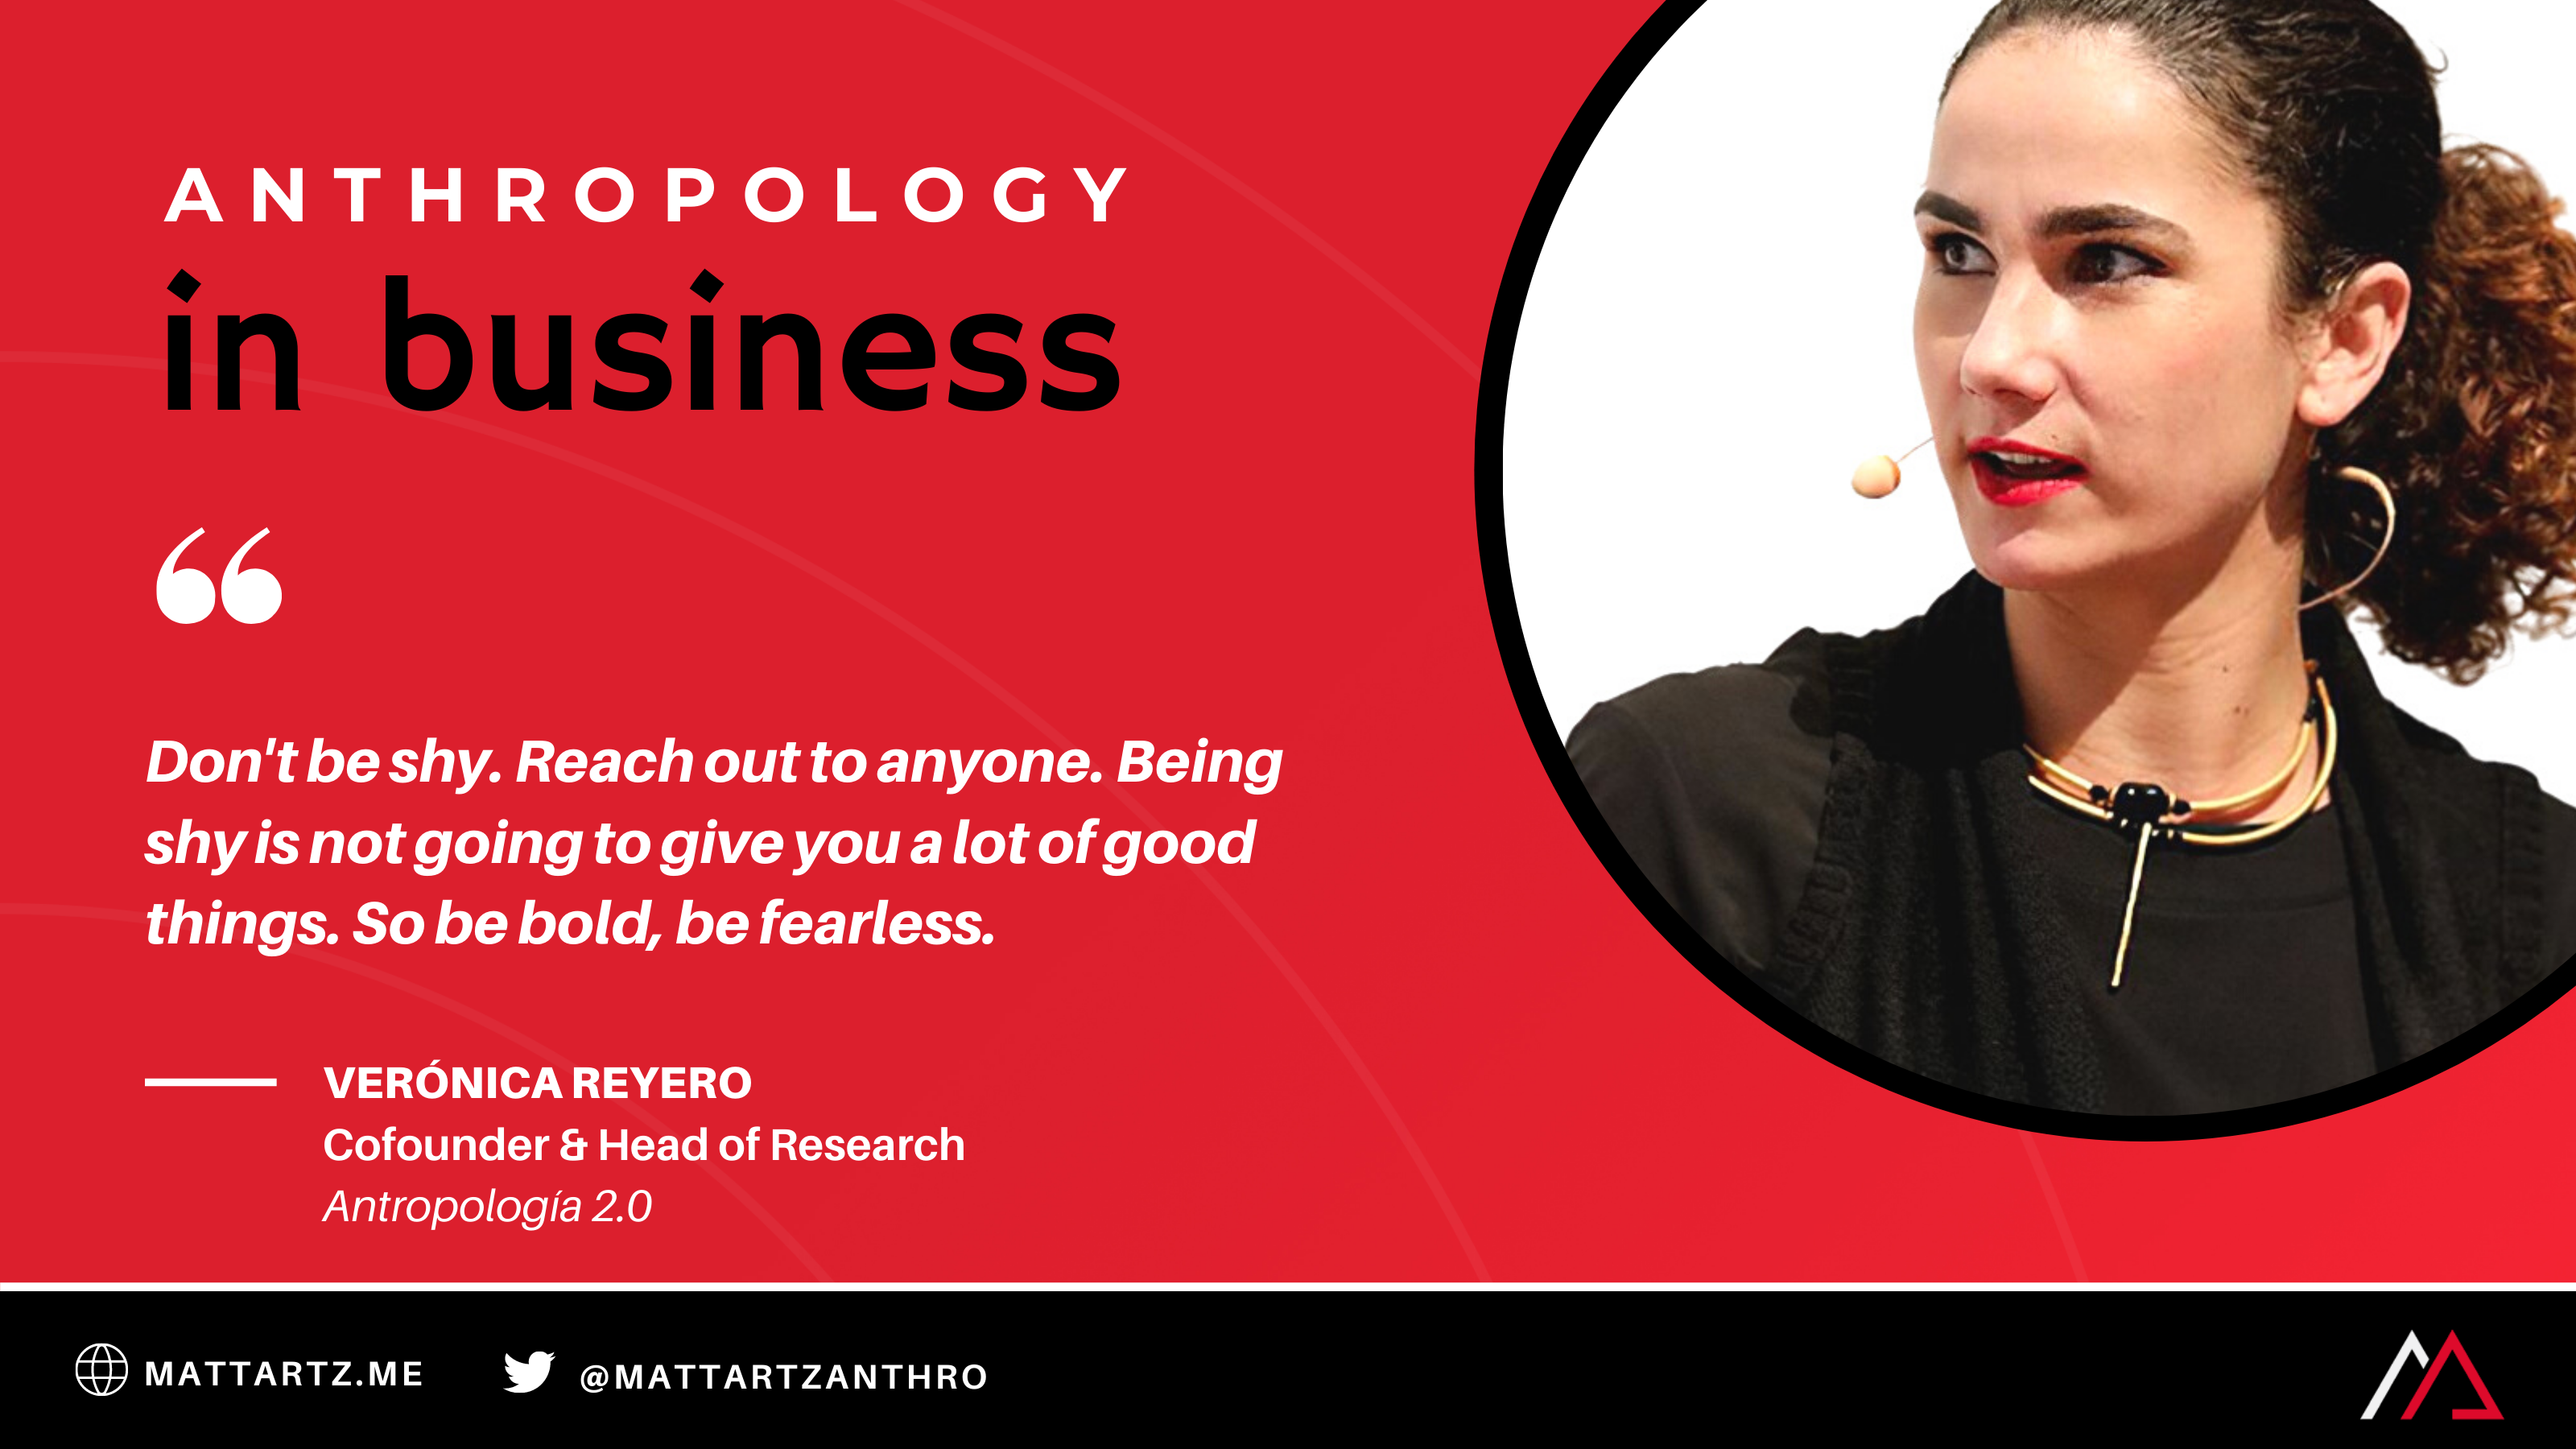 Verónica Reyero on Anthropology in Business with Matt Artz